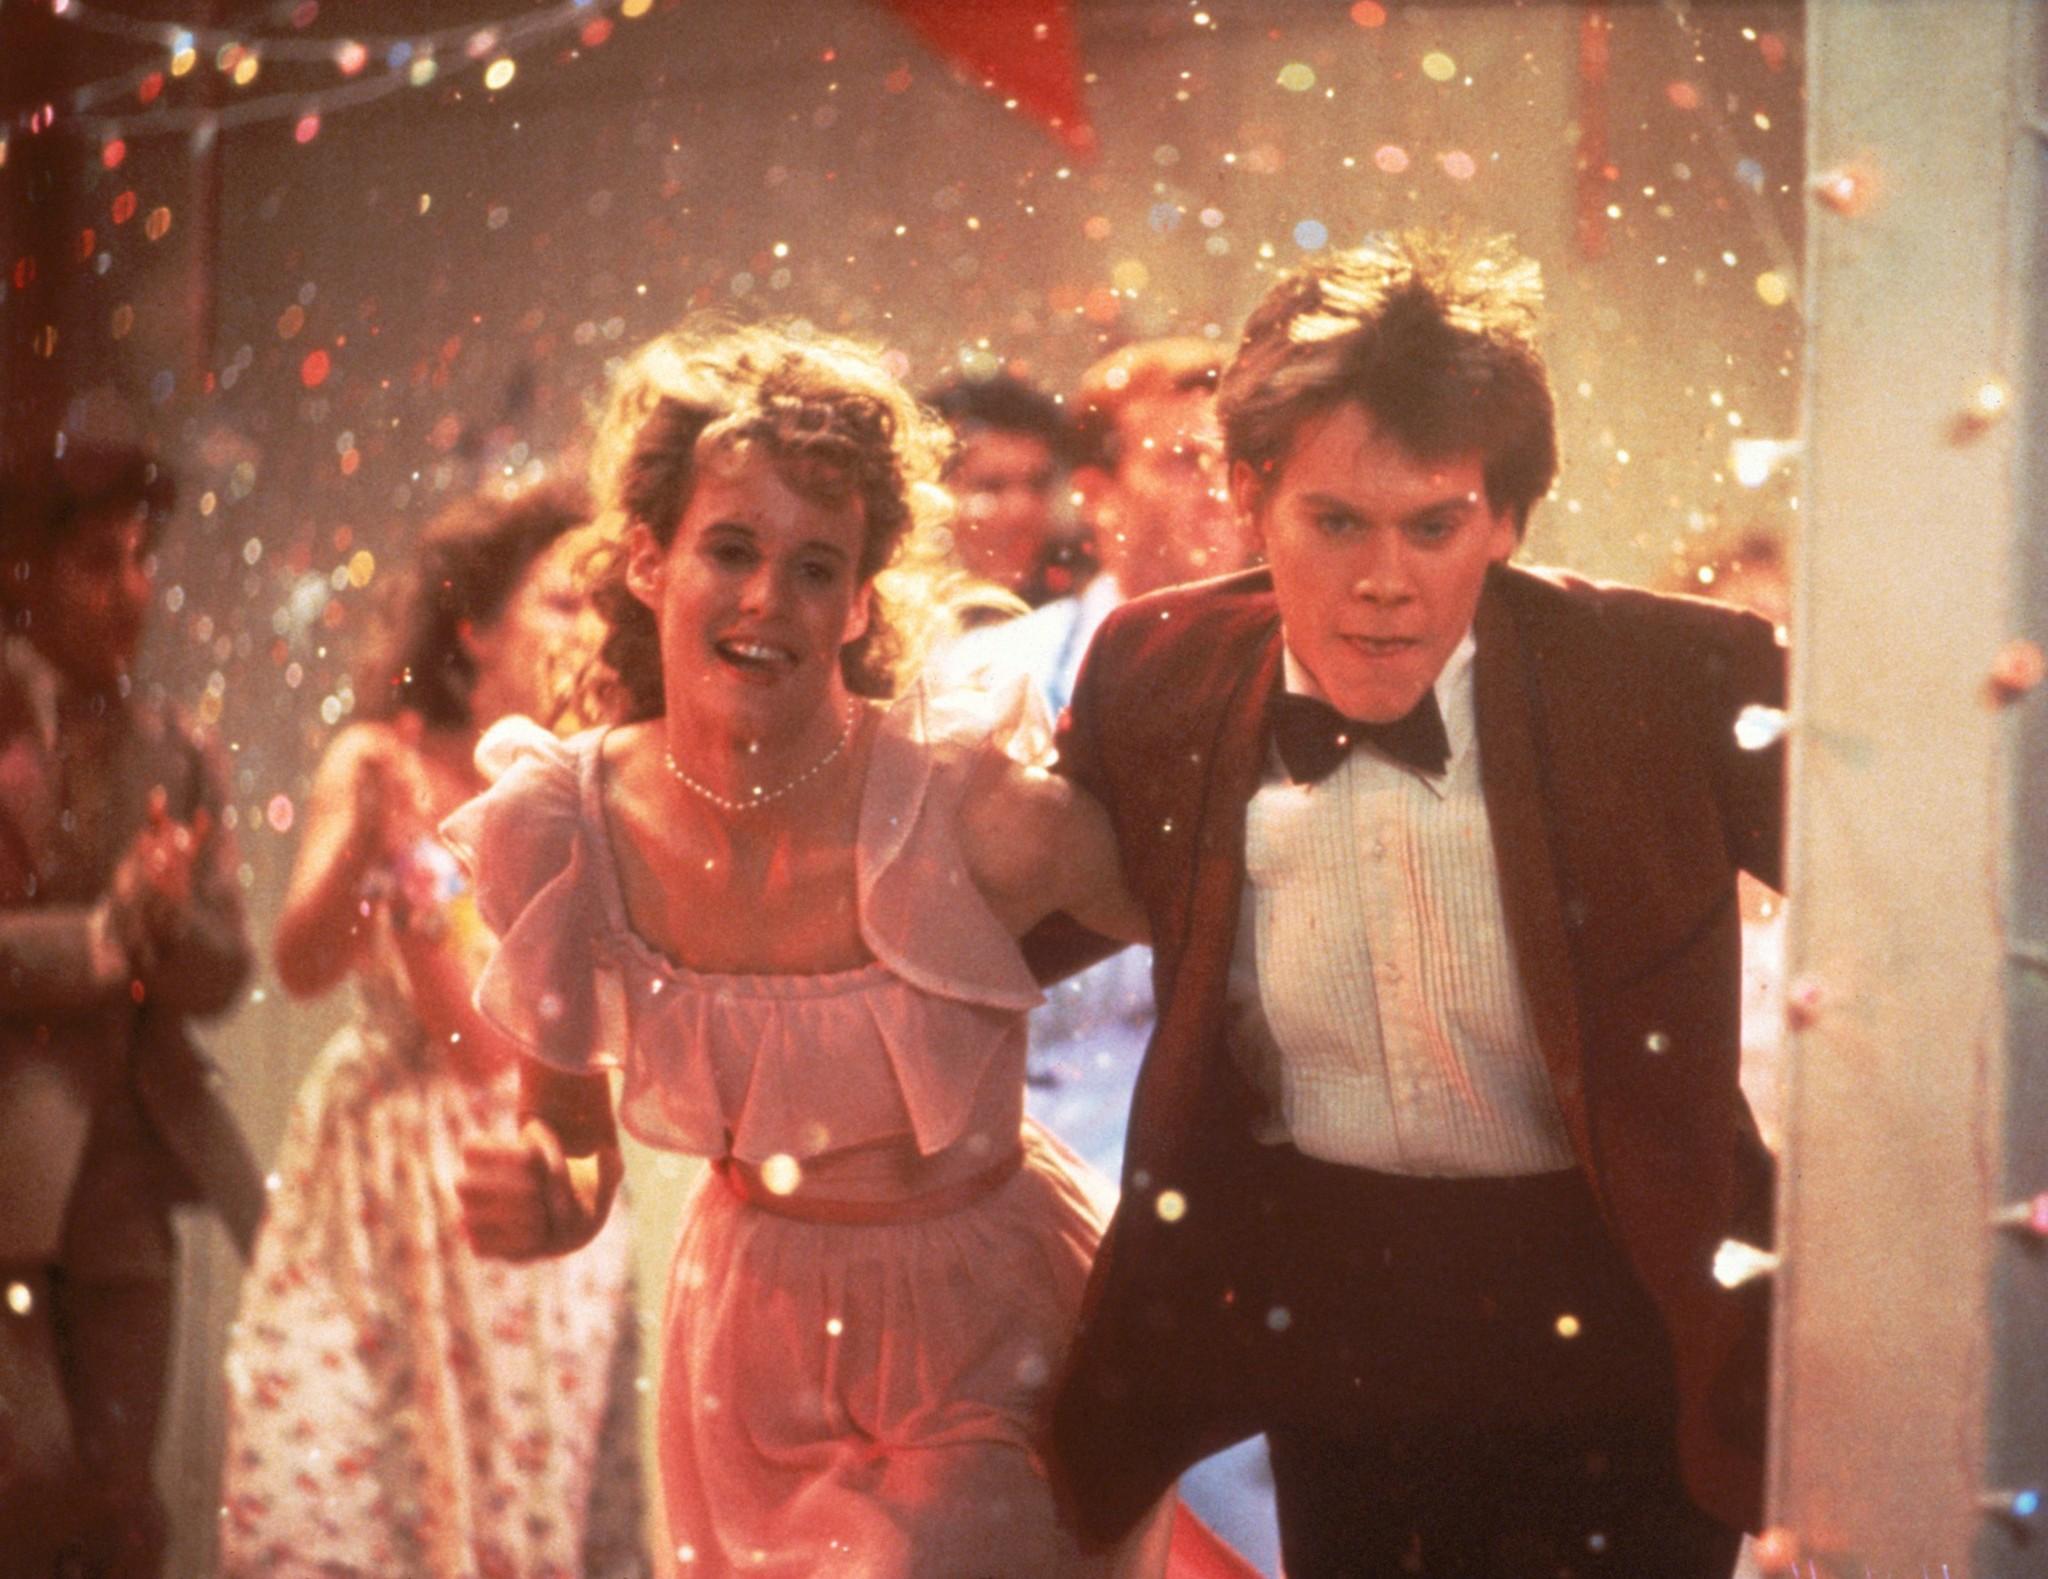 Footloose  1984  og Flashdance  1983 Footloose Movie Poster 1984